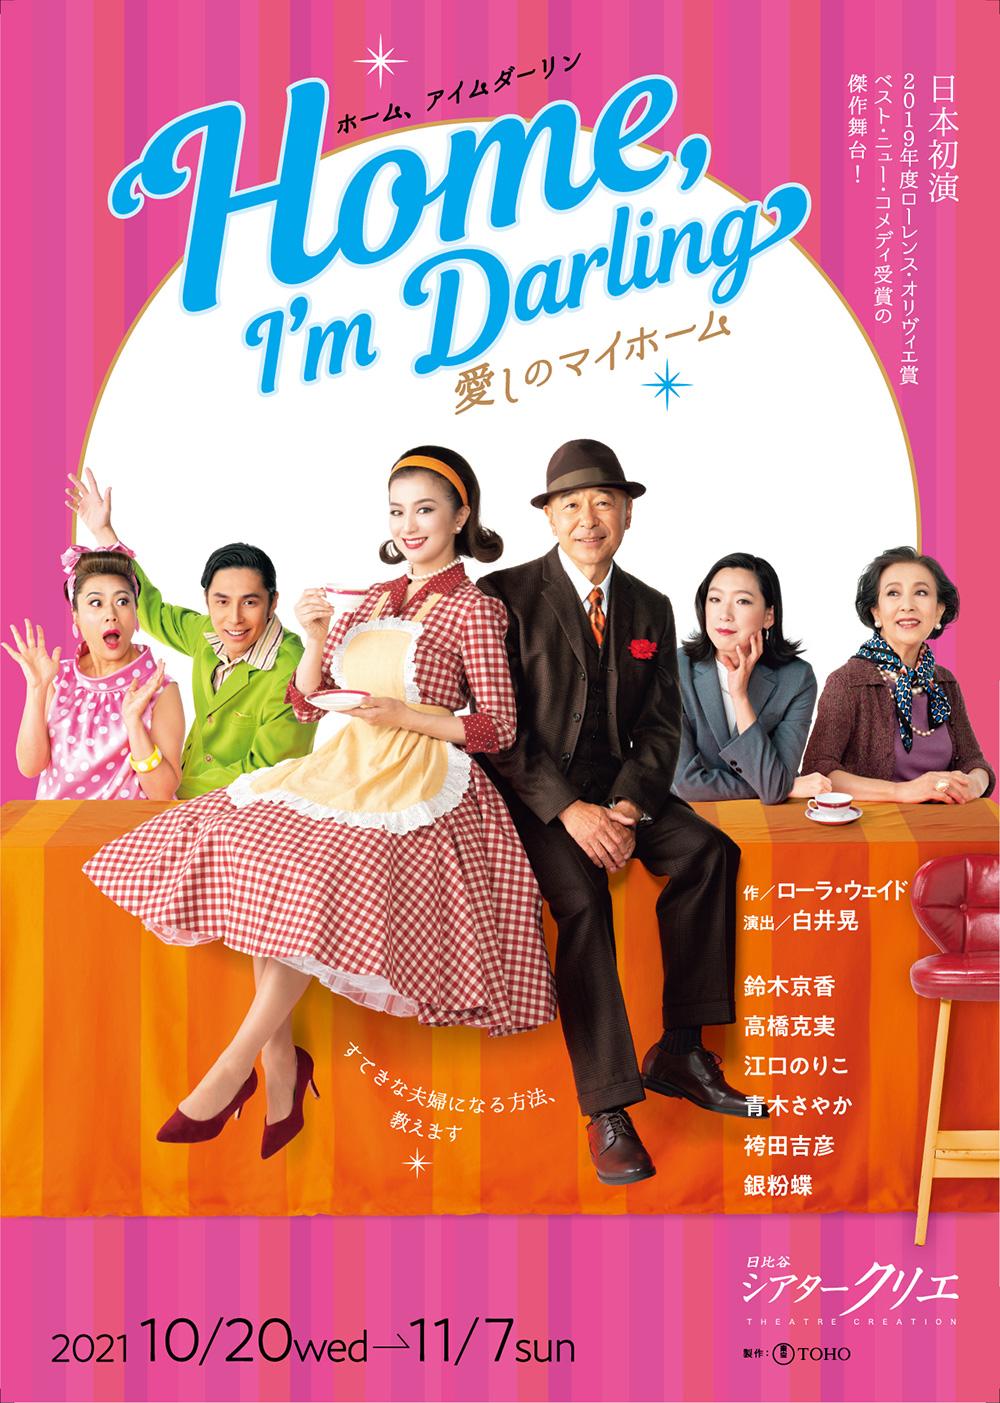 <font color=orange>【優待価格&特選弁当付】</font>『Home, I'm Darling~愛しのマイホーム~』